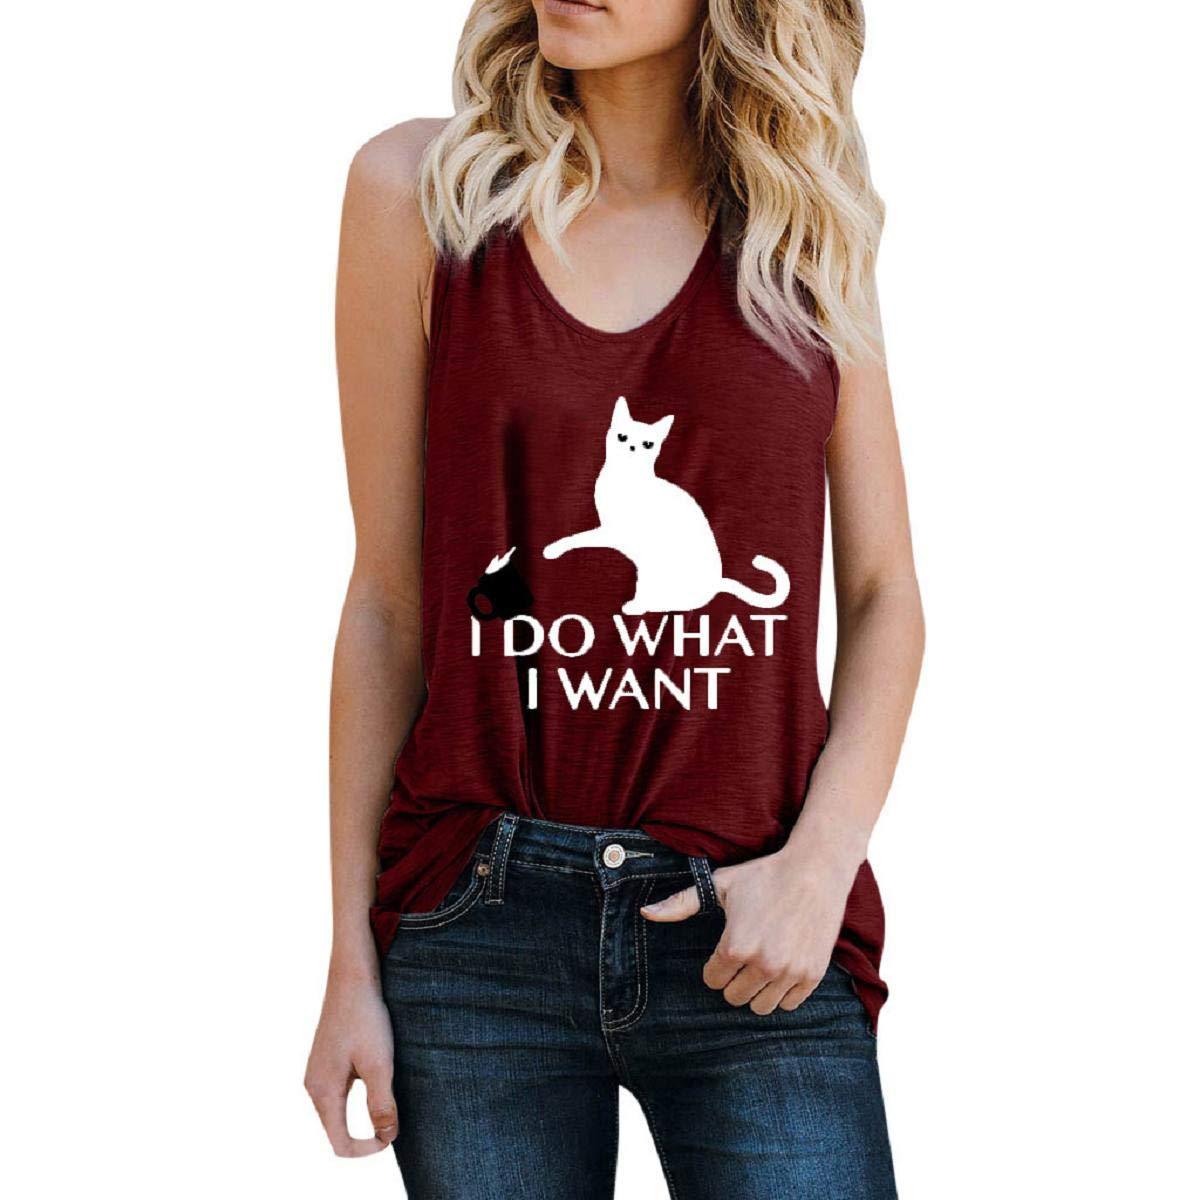 Amazon.com: Camiseta sin mangas para mujer, camiseta sin ...